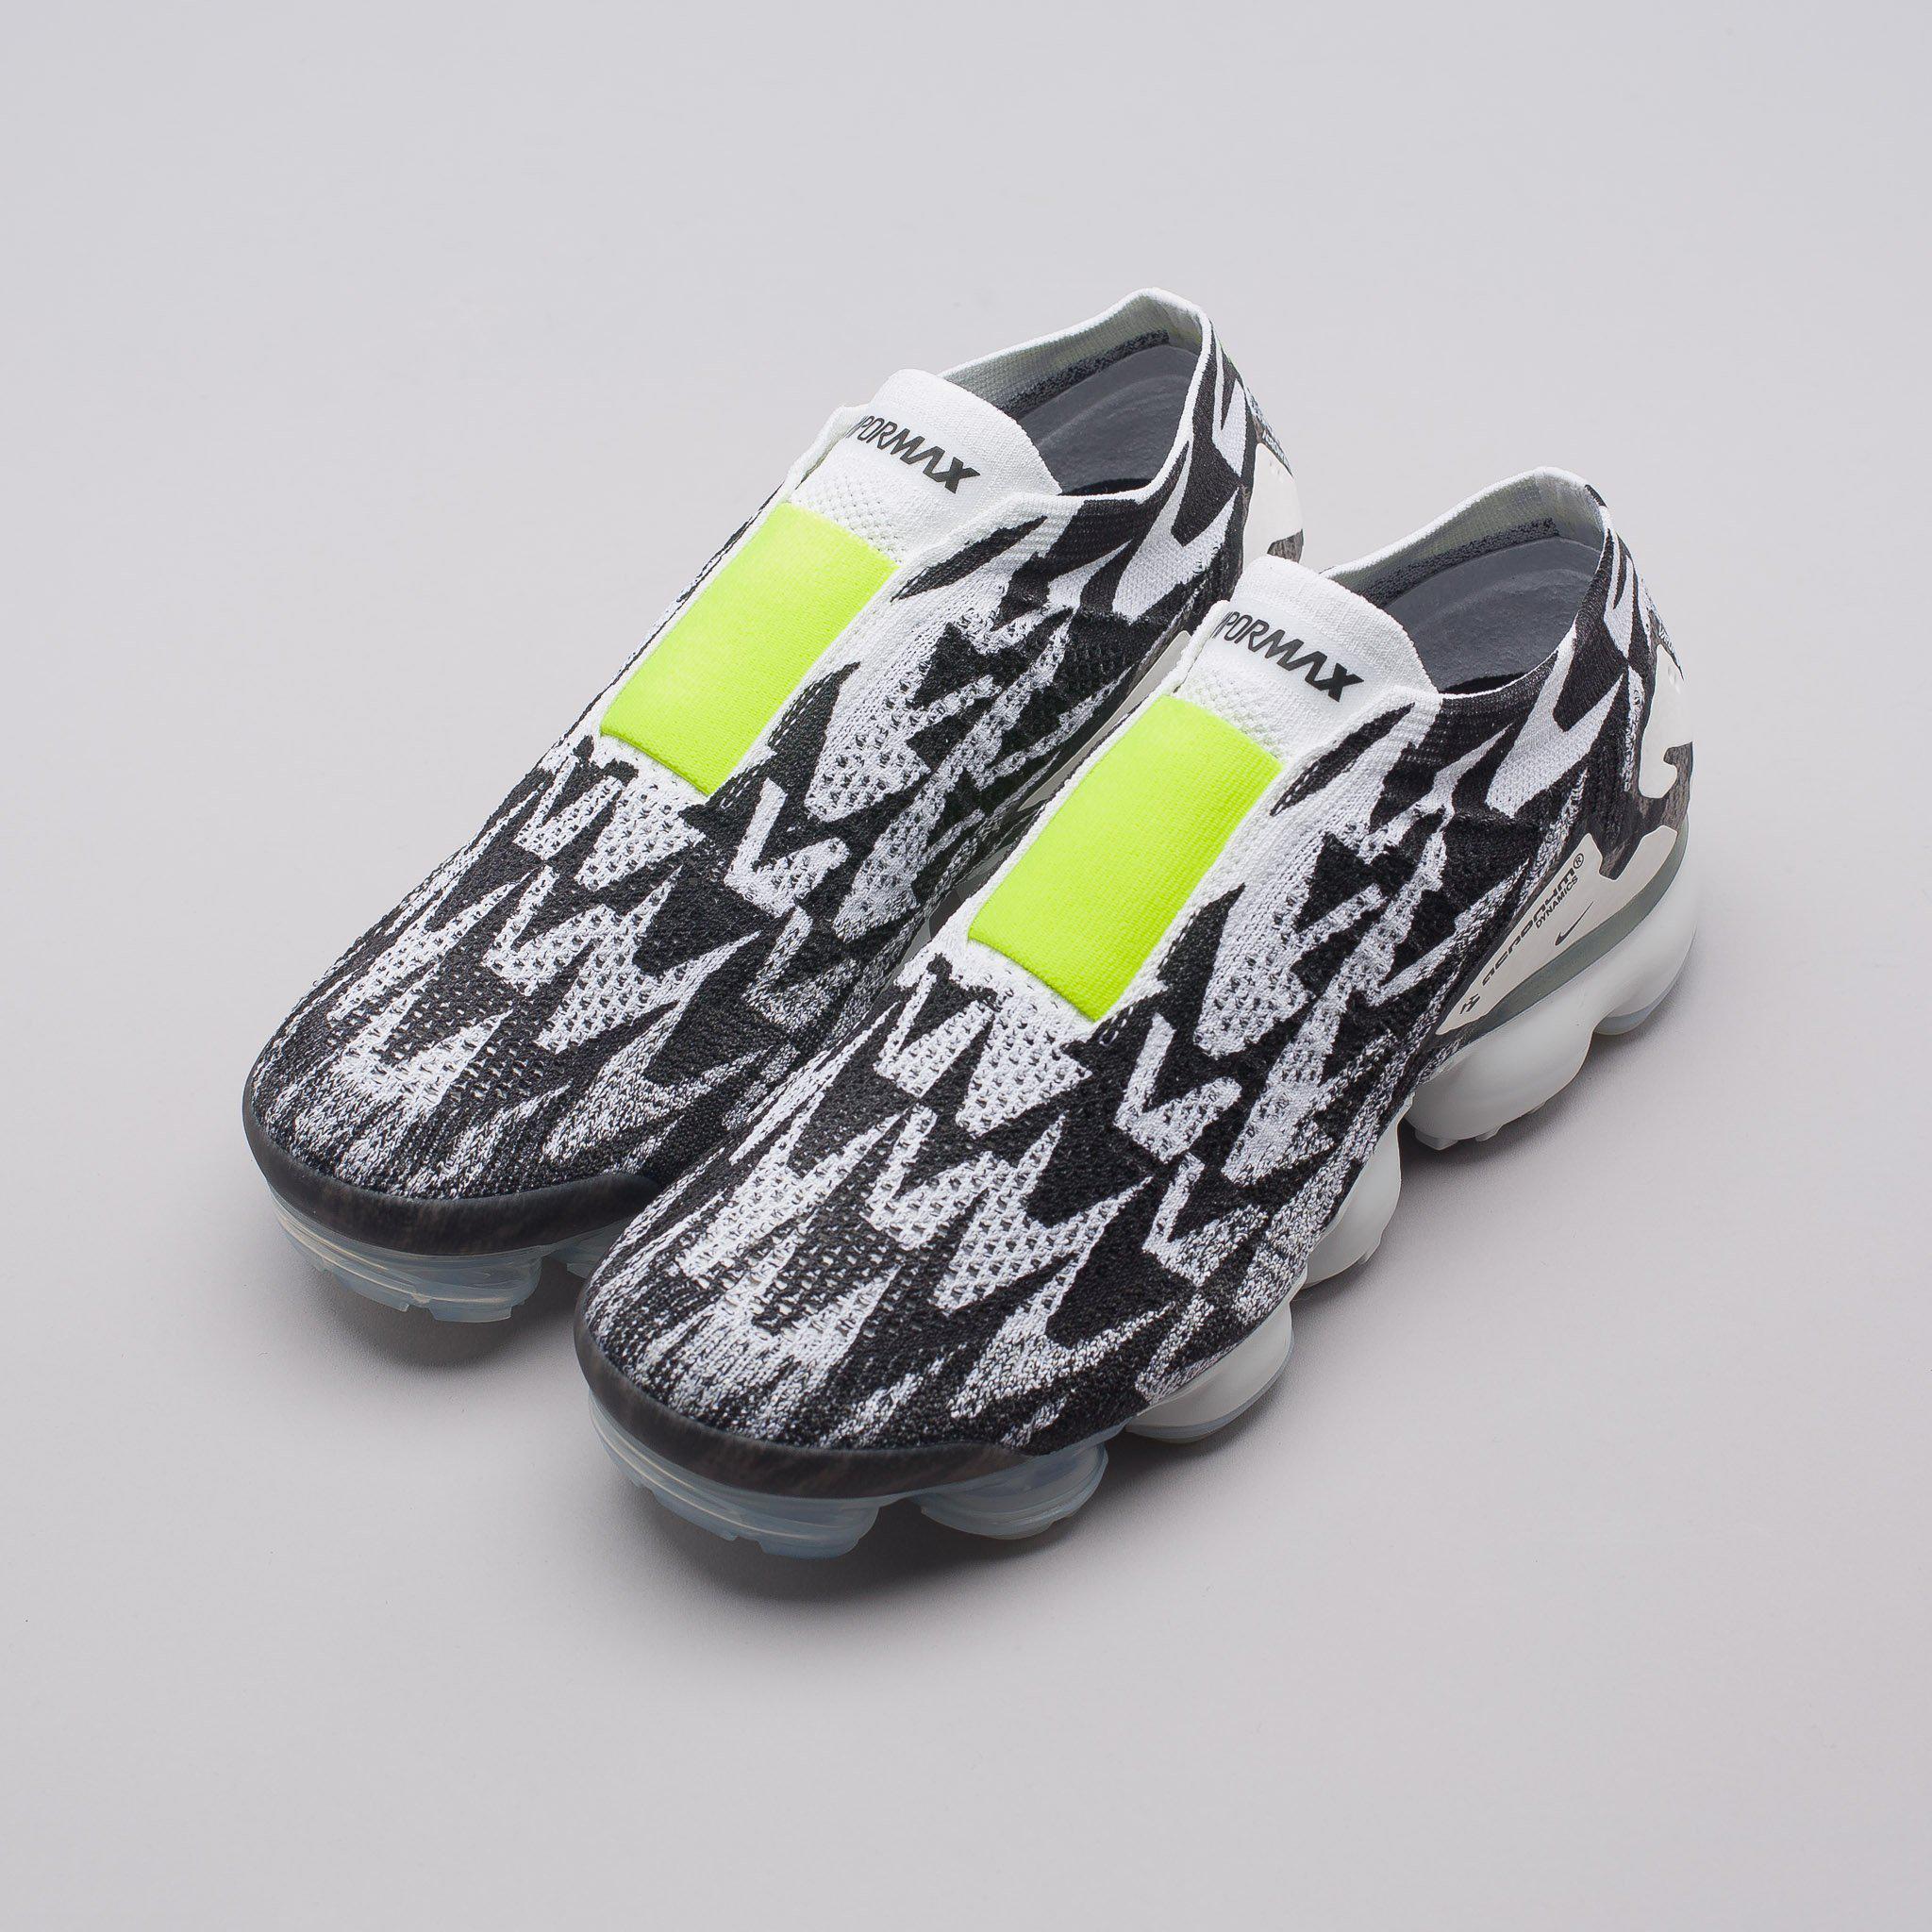 info for 0c3ee 1806b Lyst - Nike X Acronym Air Vapormax Fk Moc 2 In Light Bonevol